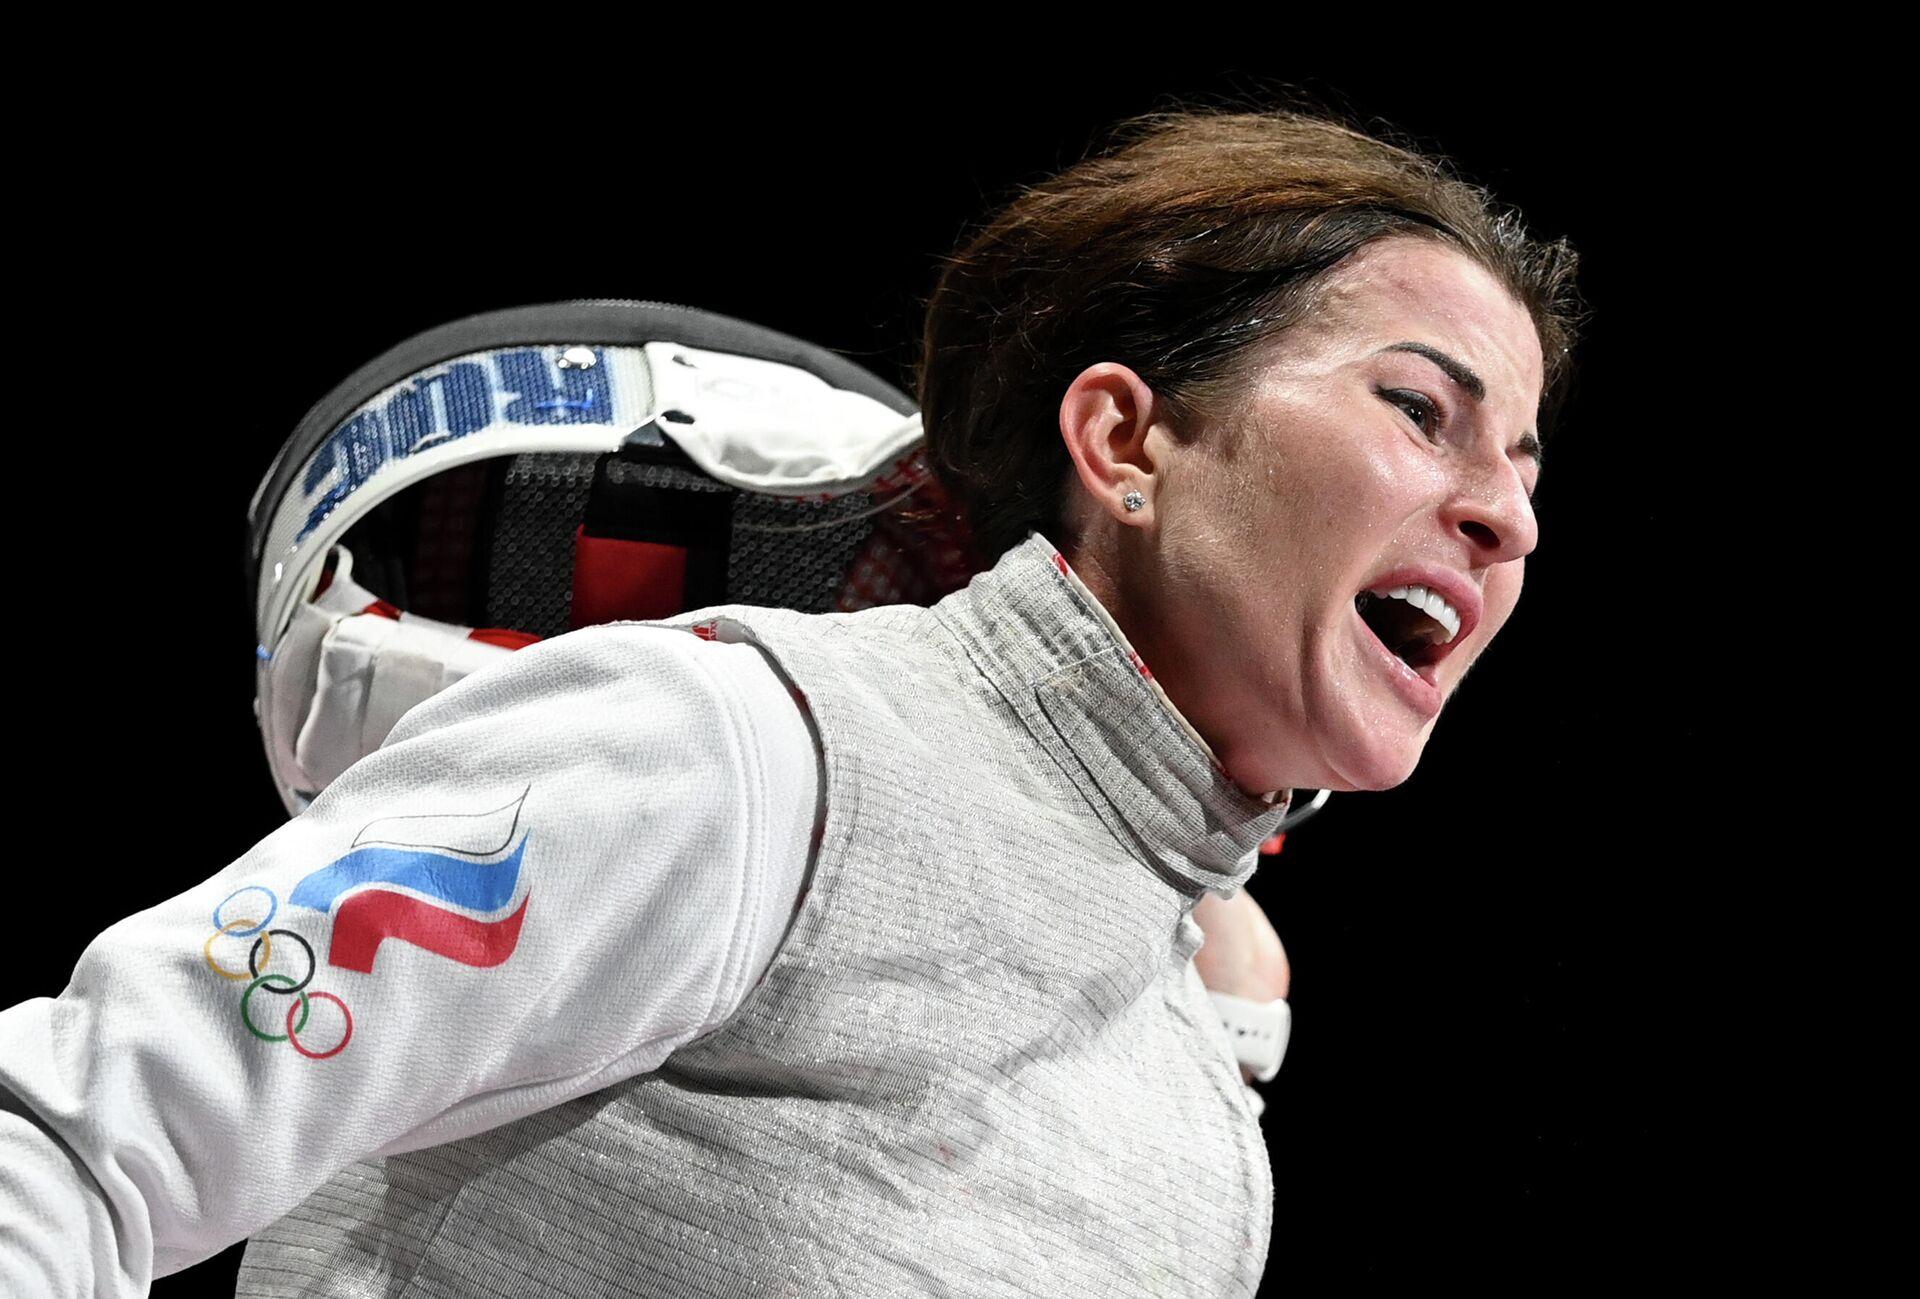 Олимпиада-2020. Фехтование. Женщины. Рапира - РИА Новости, 1920, 28.07.2021